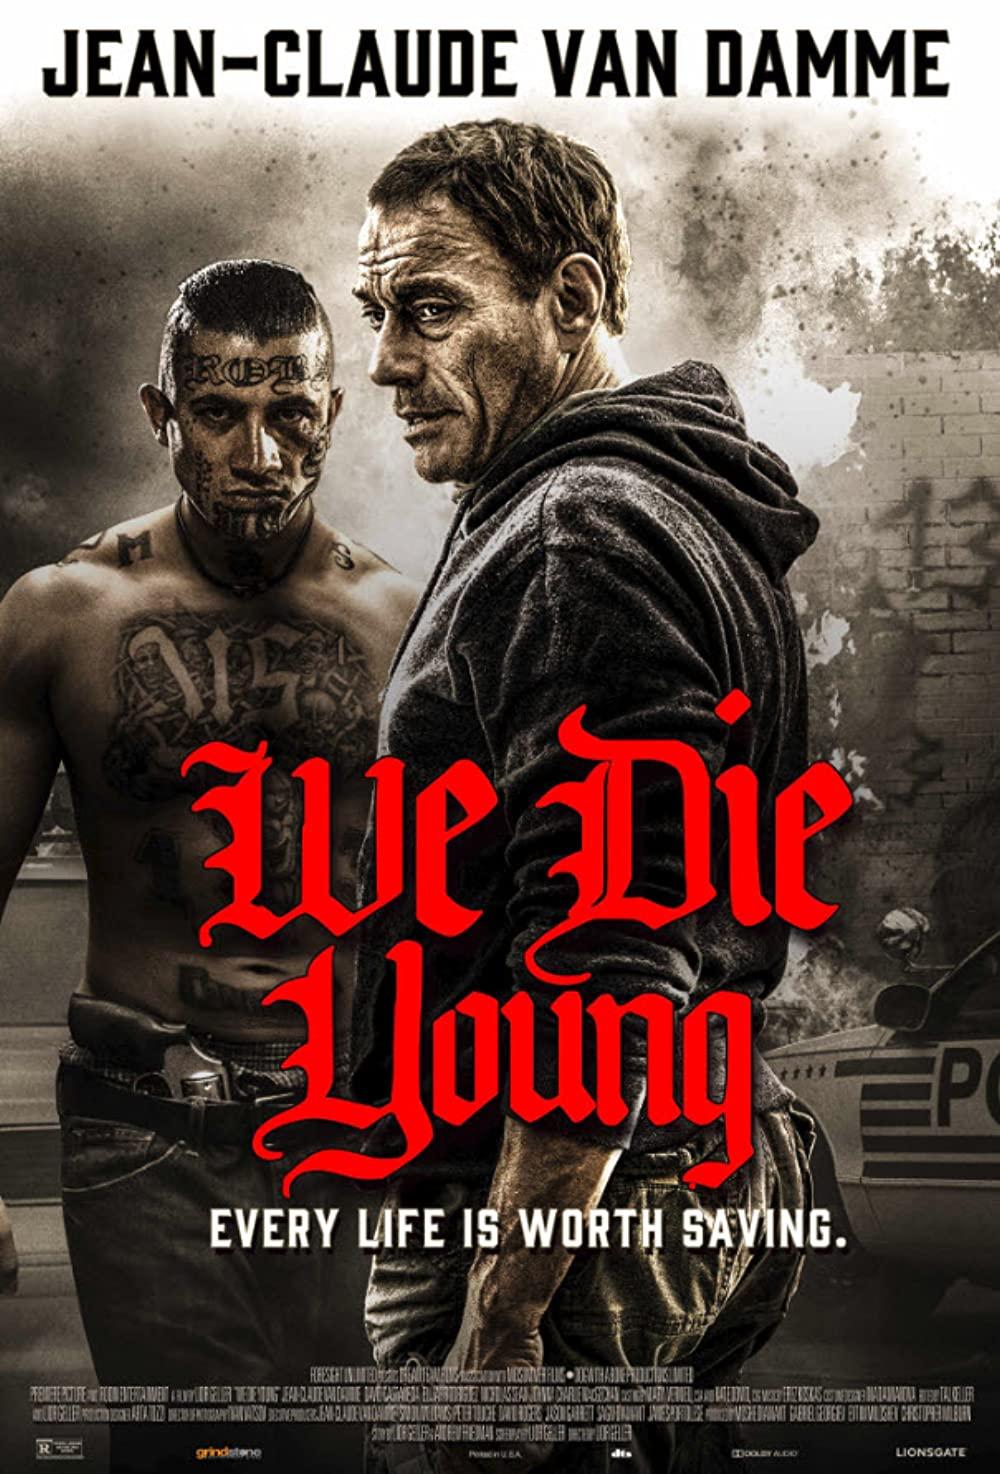 We-Die-Young-(2019)-หักเหลี่ยมแก๊งค์เลือดร้อน